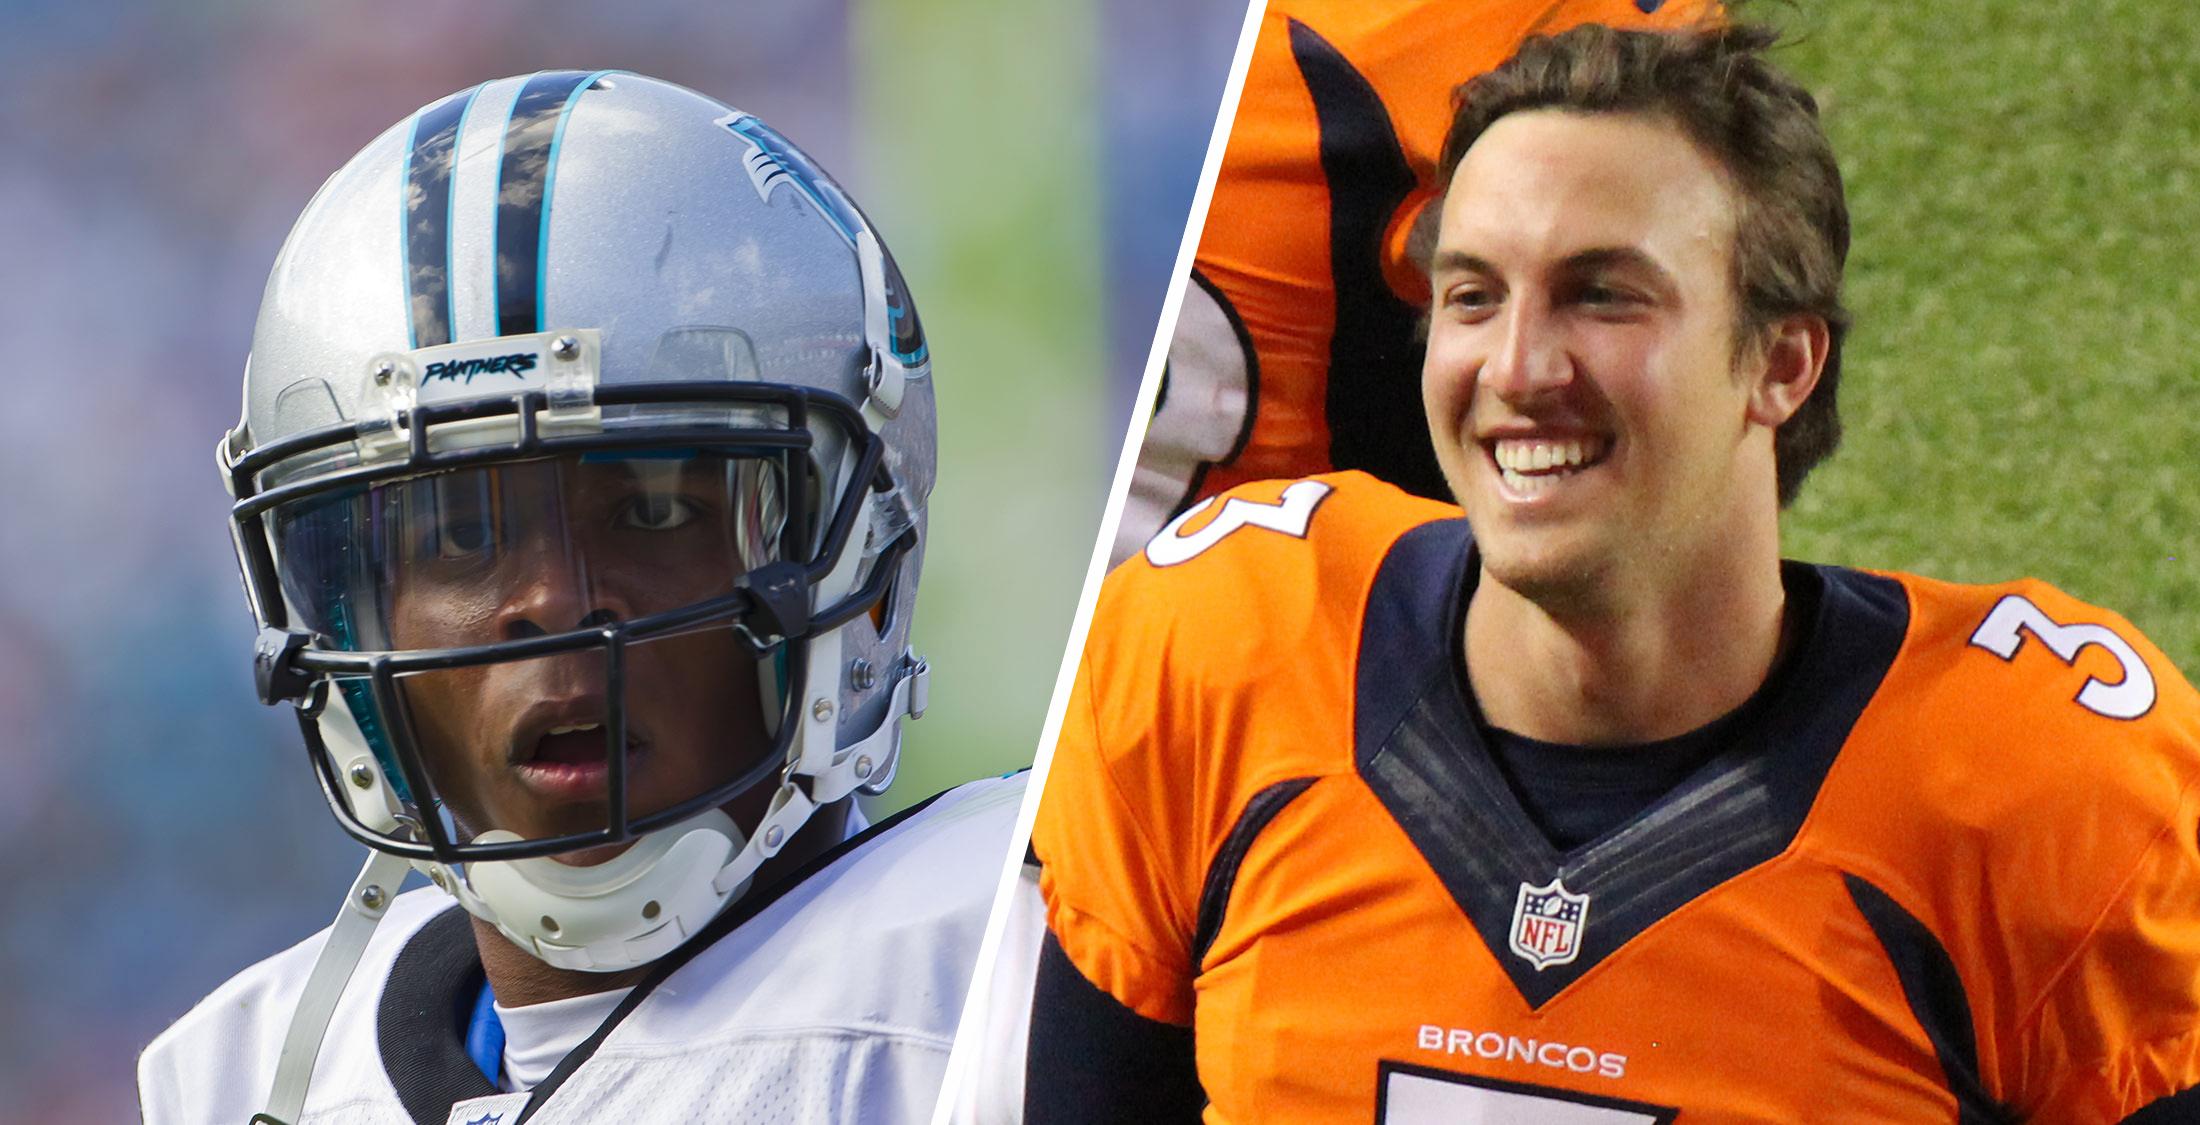 2016 NFL Season Opener Quarterback Showdown: Cam Newton Net Worth vs